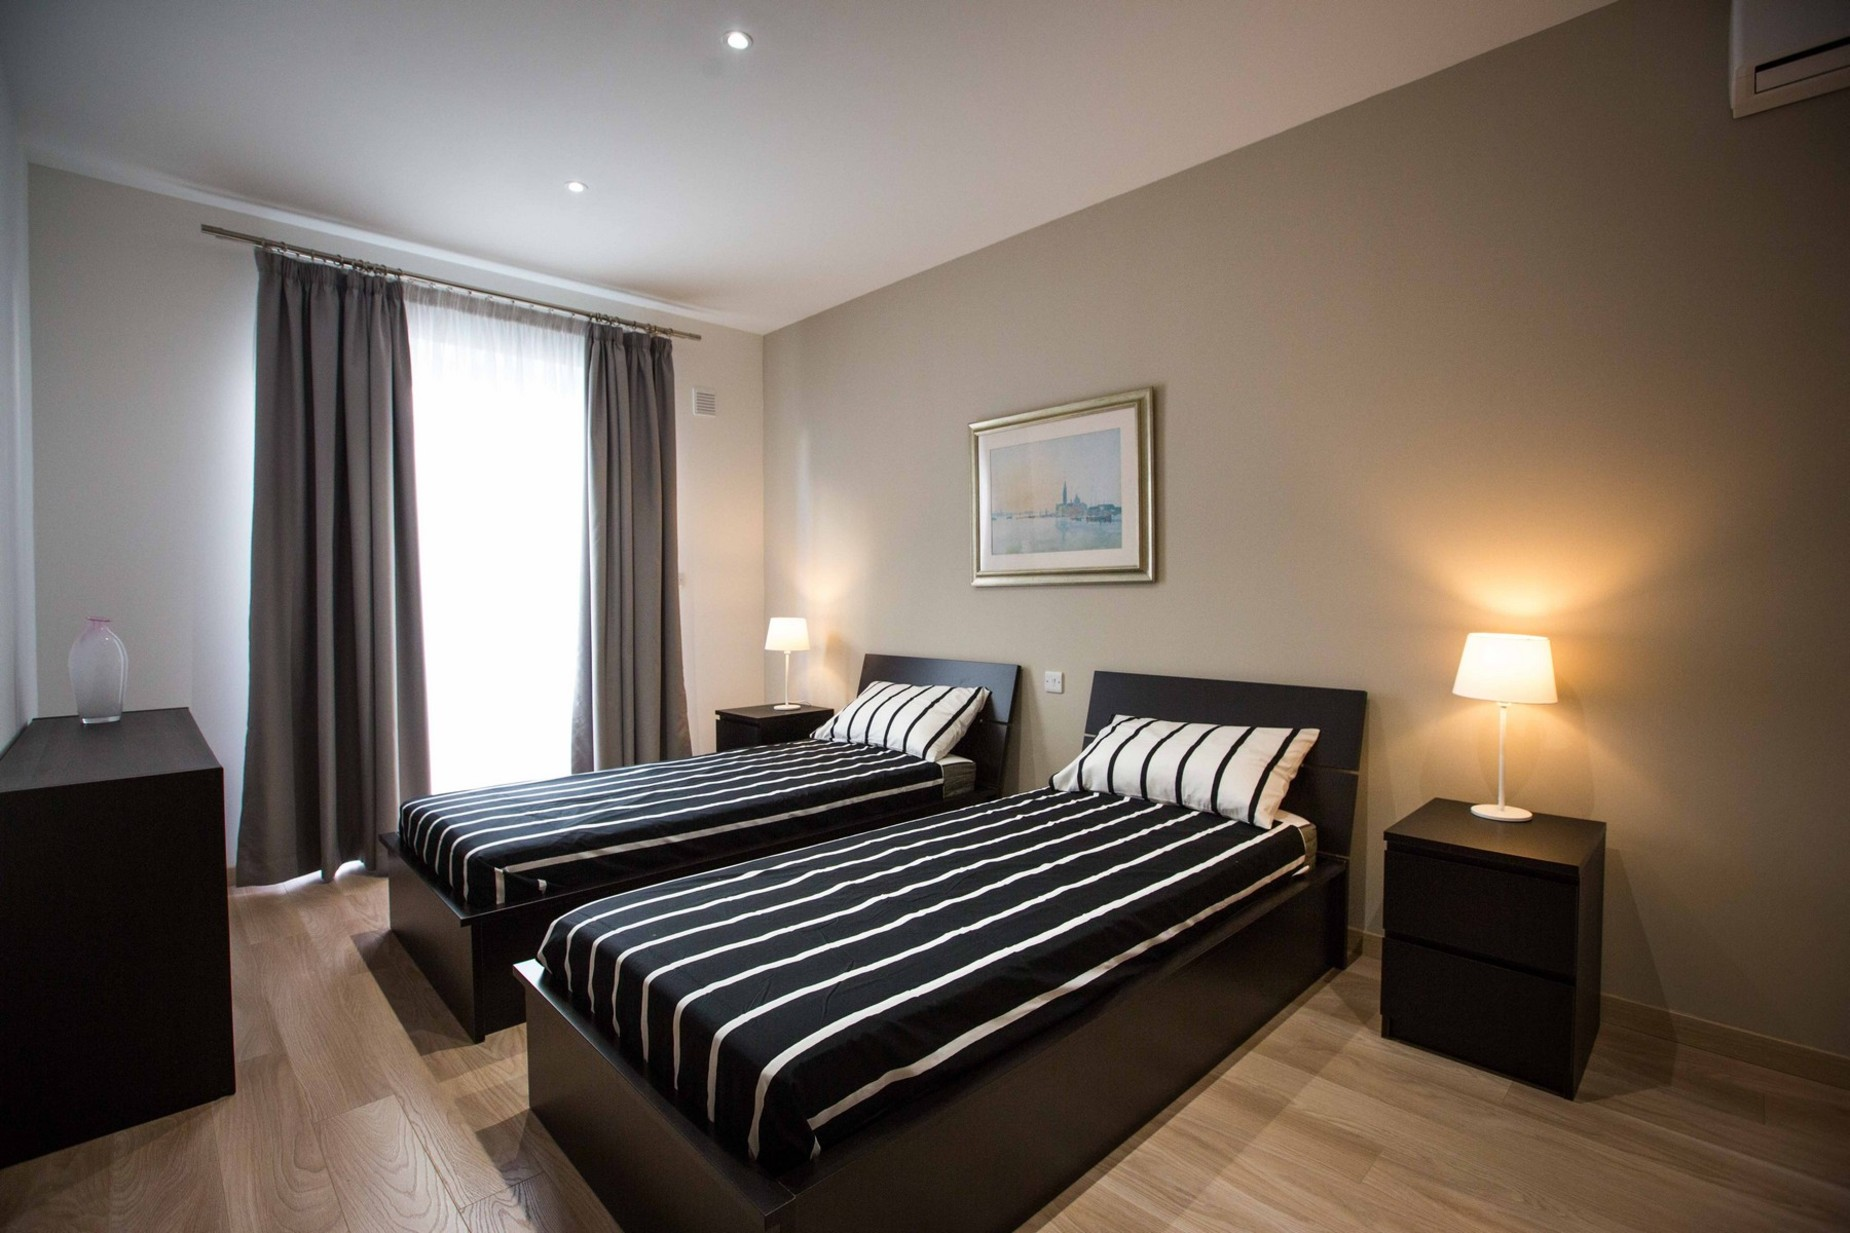 0 bed Apartment For Rent in Naxxar, Naxxar - thumb 5